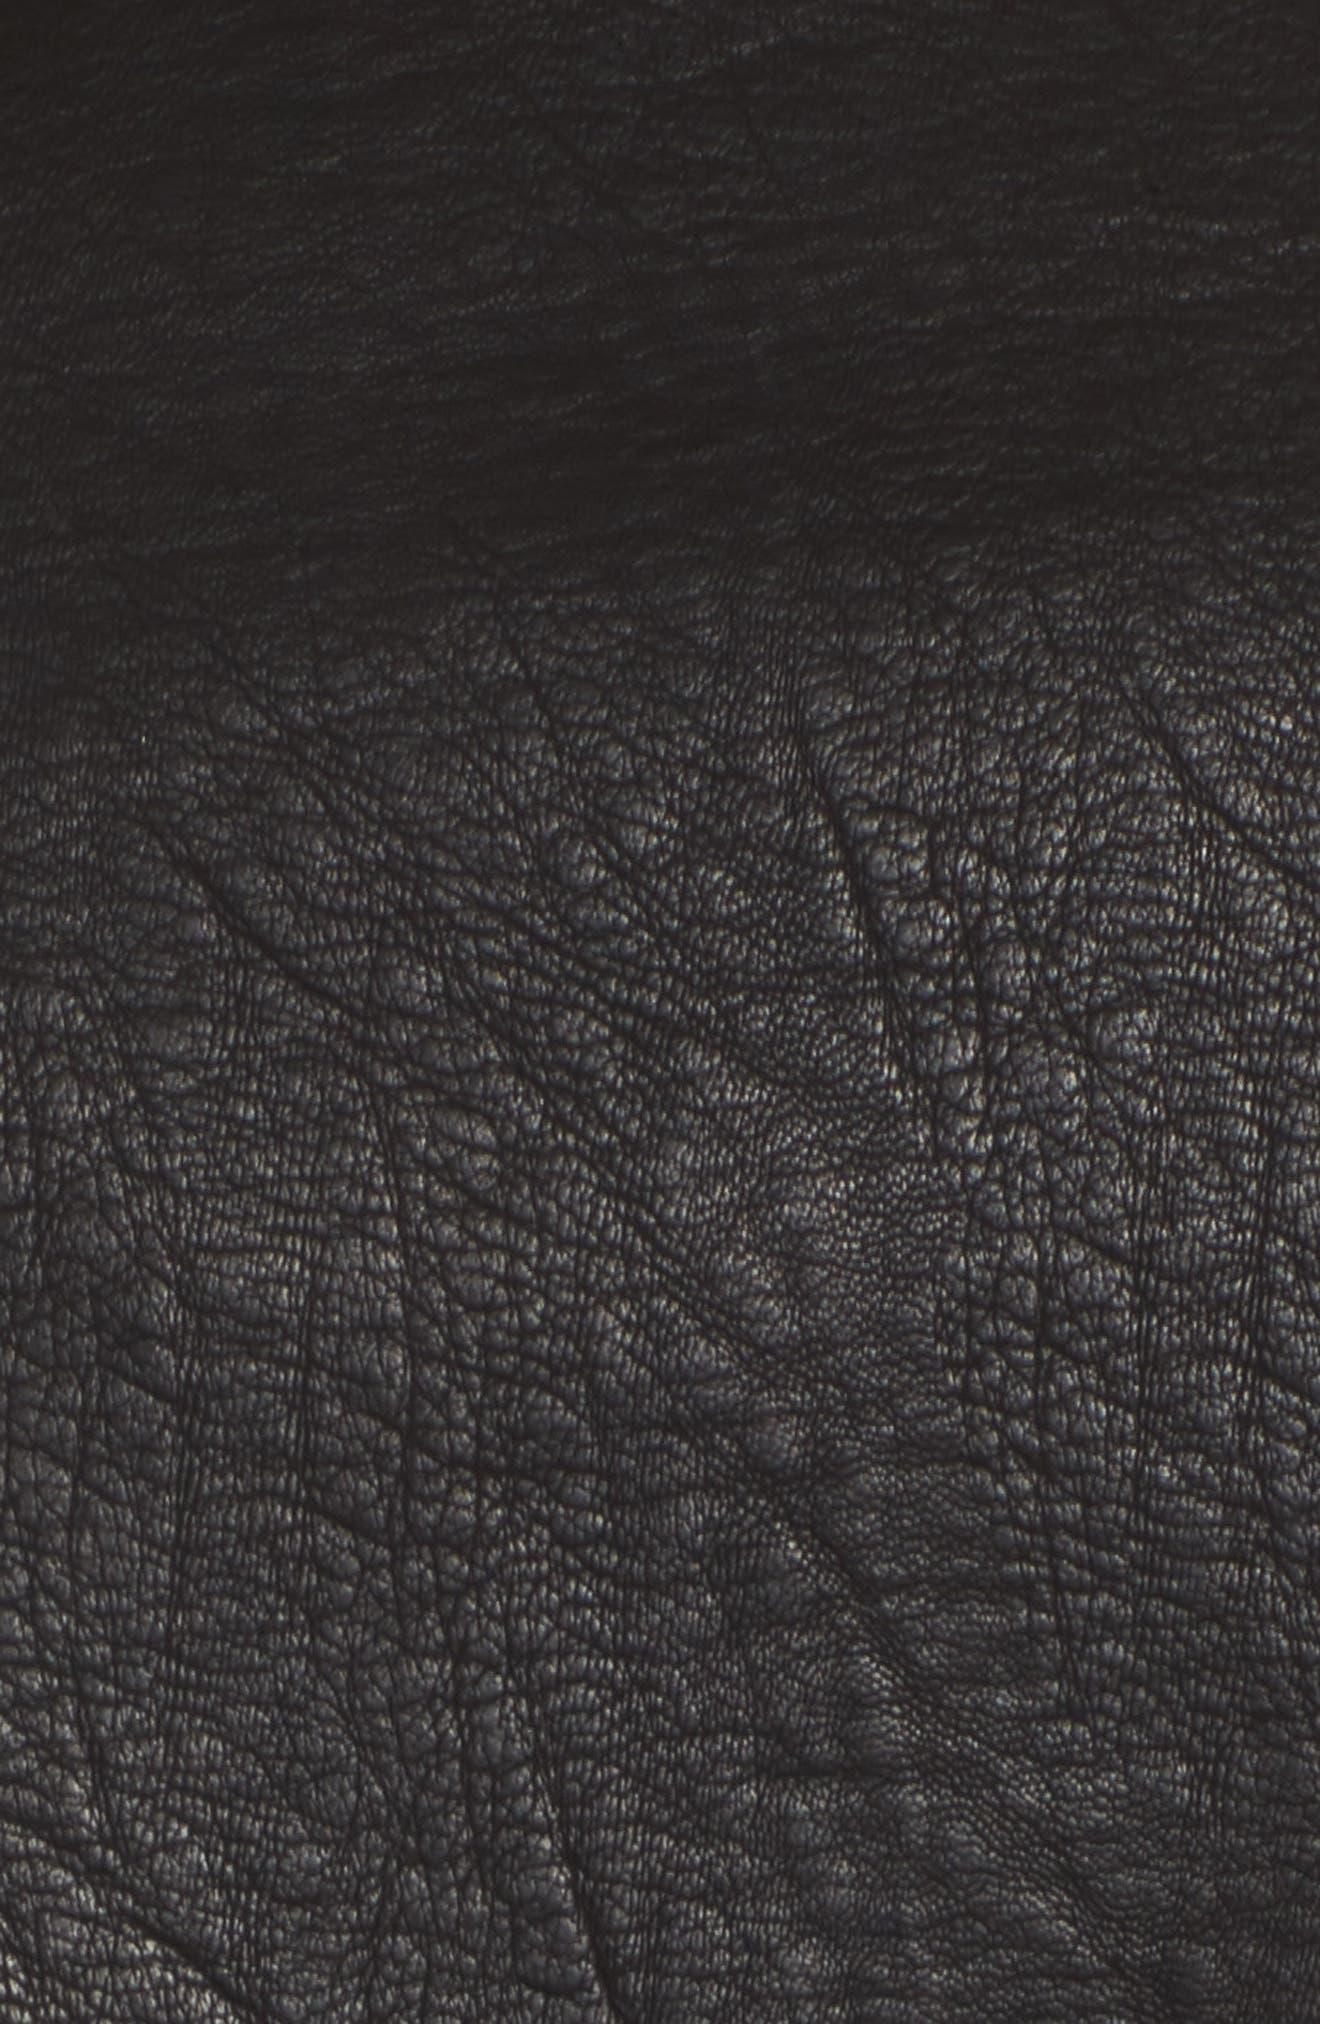 Embellished Faux Leather Moto Jacket,                             Alternate thumbnail 5, color,                             Crown Jewels